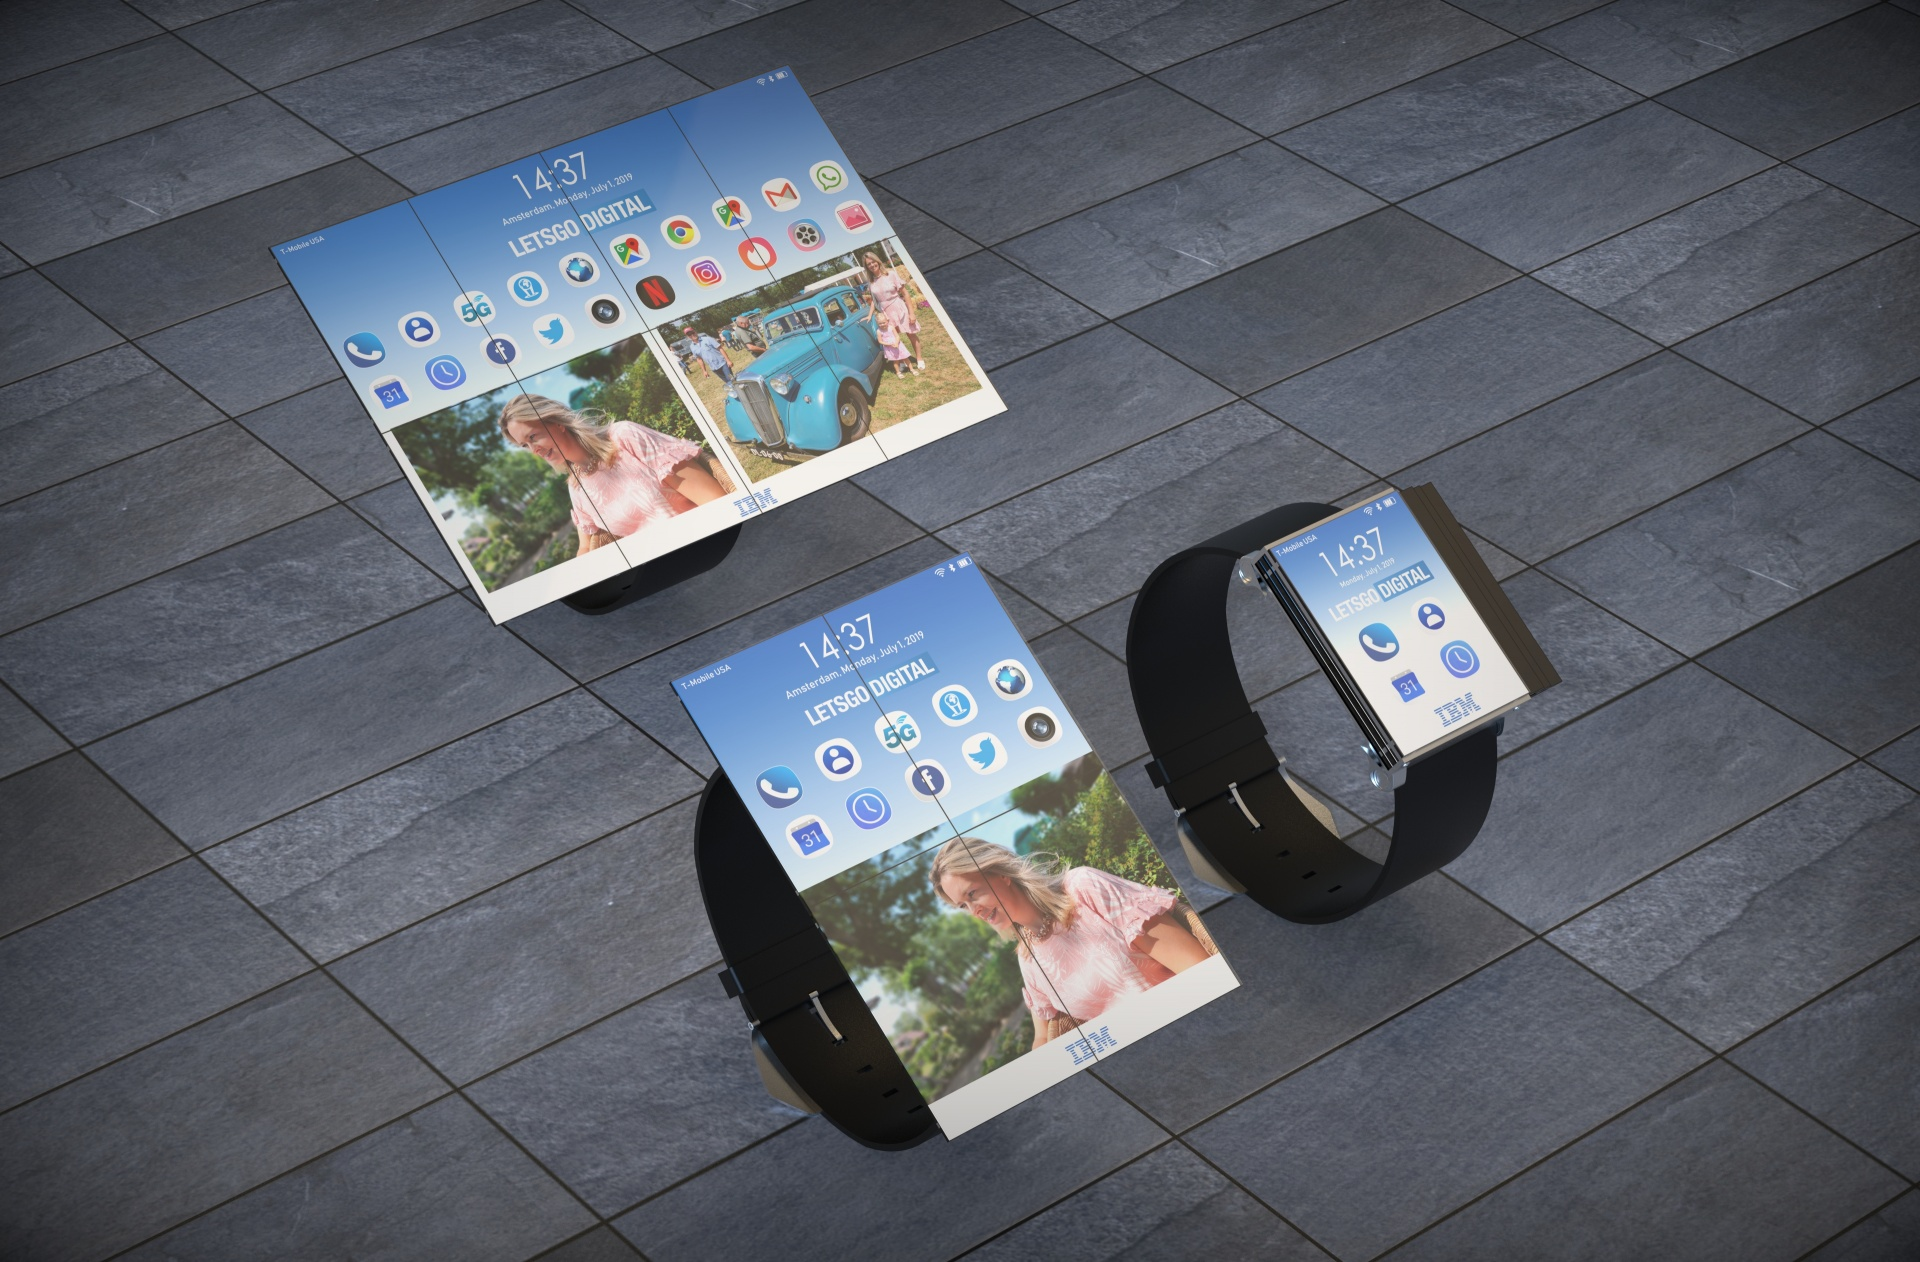 IBM запатентовала гибрид смарт-часов, смартфона и планшета